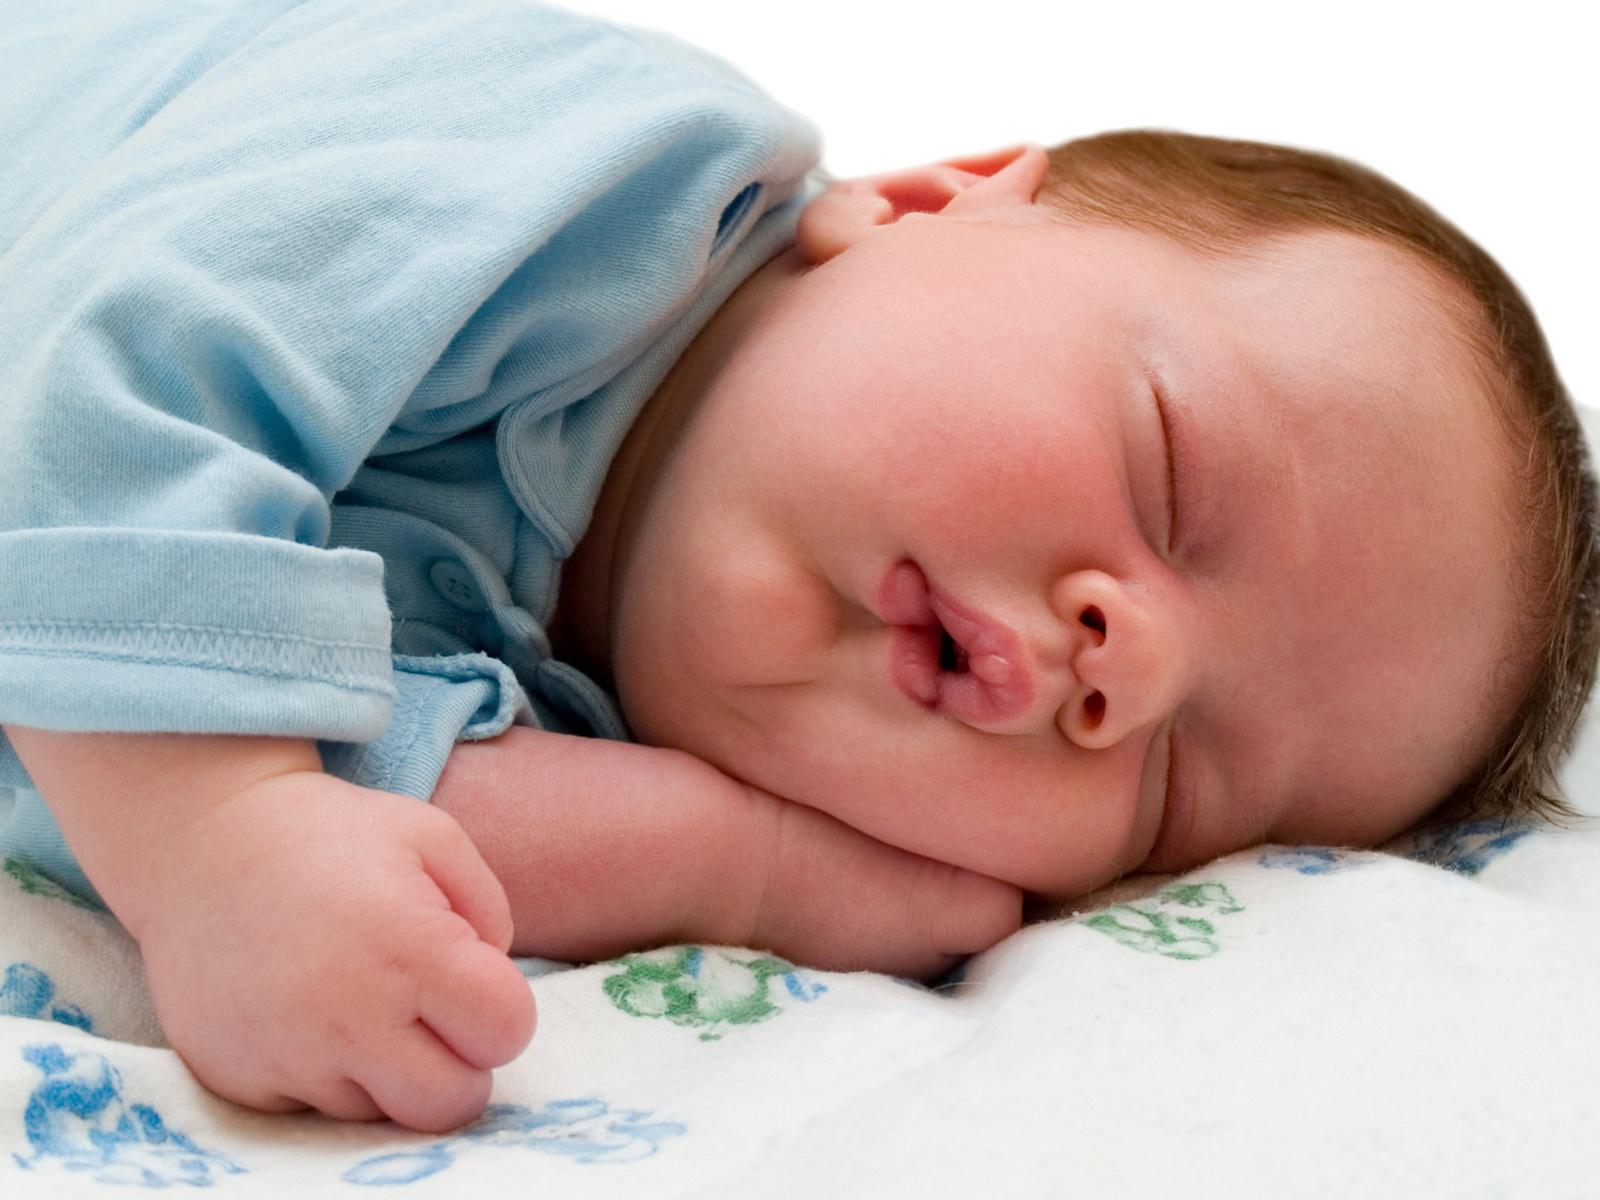 Niños descansando - Imagui